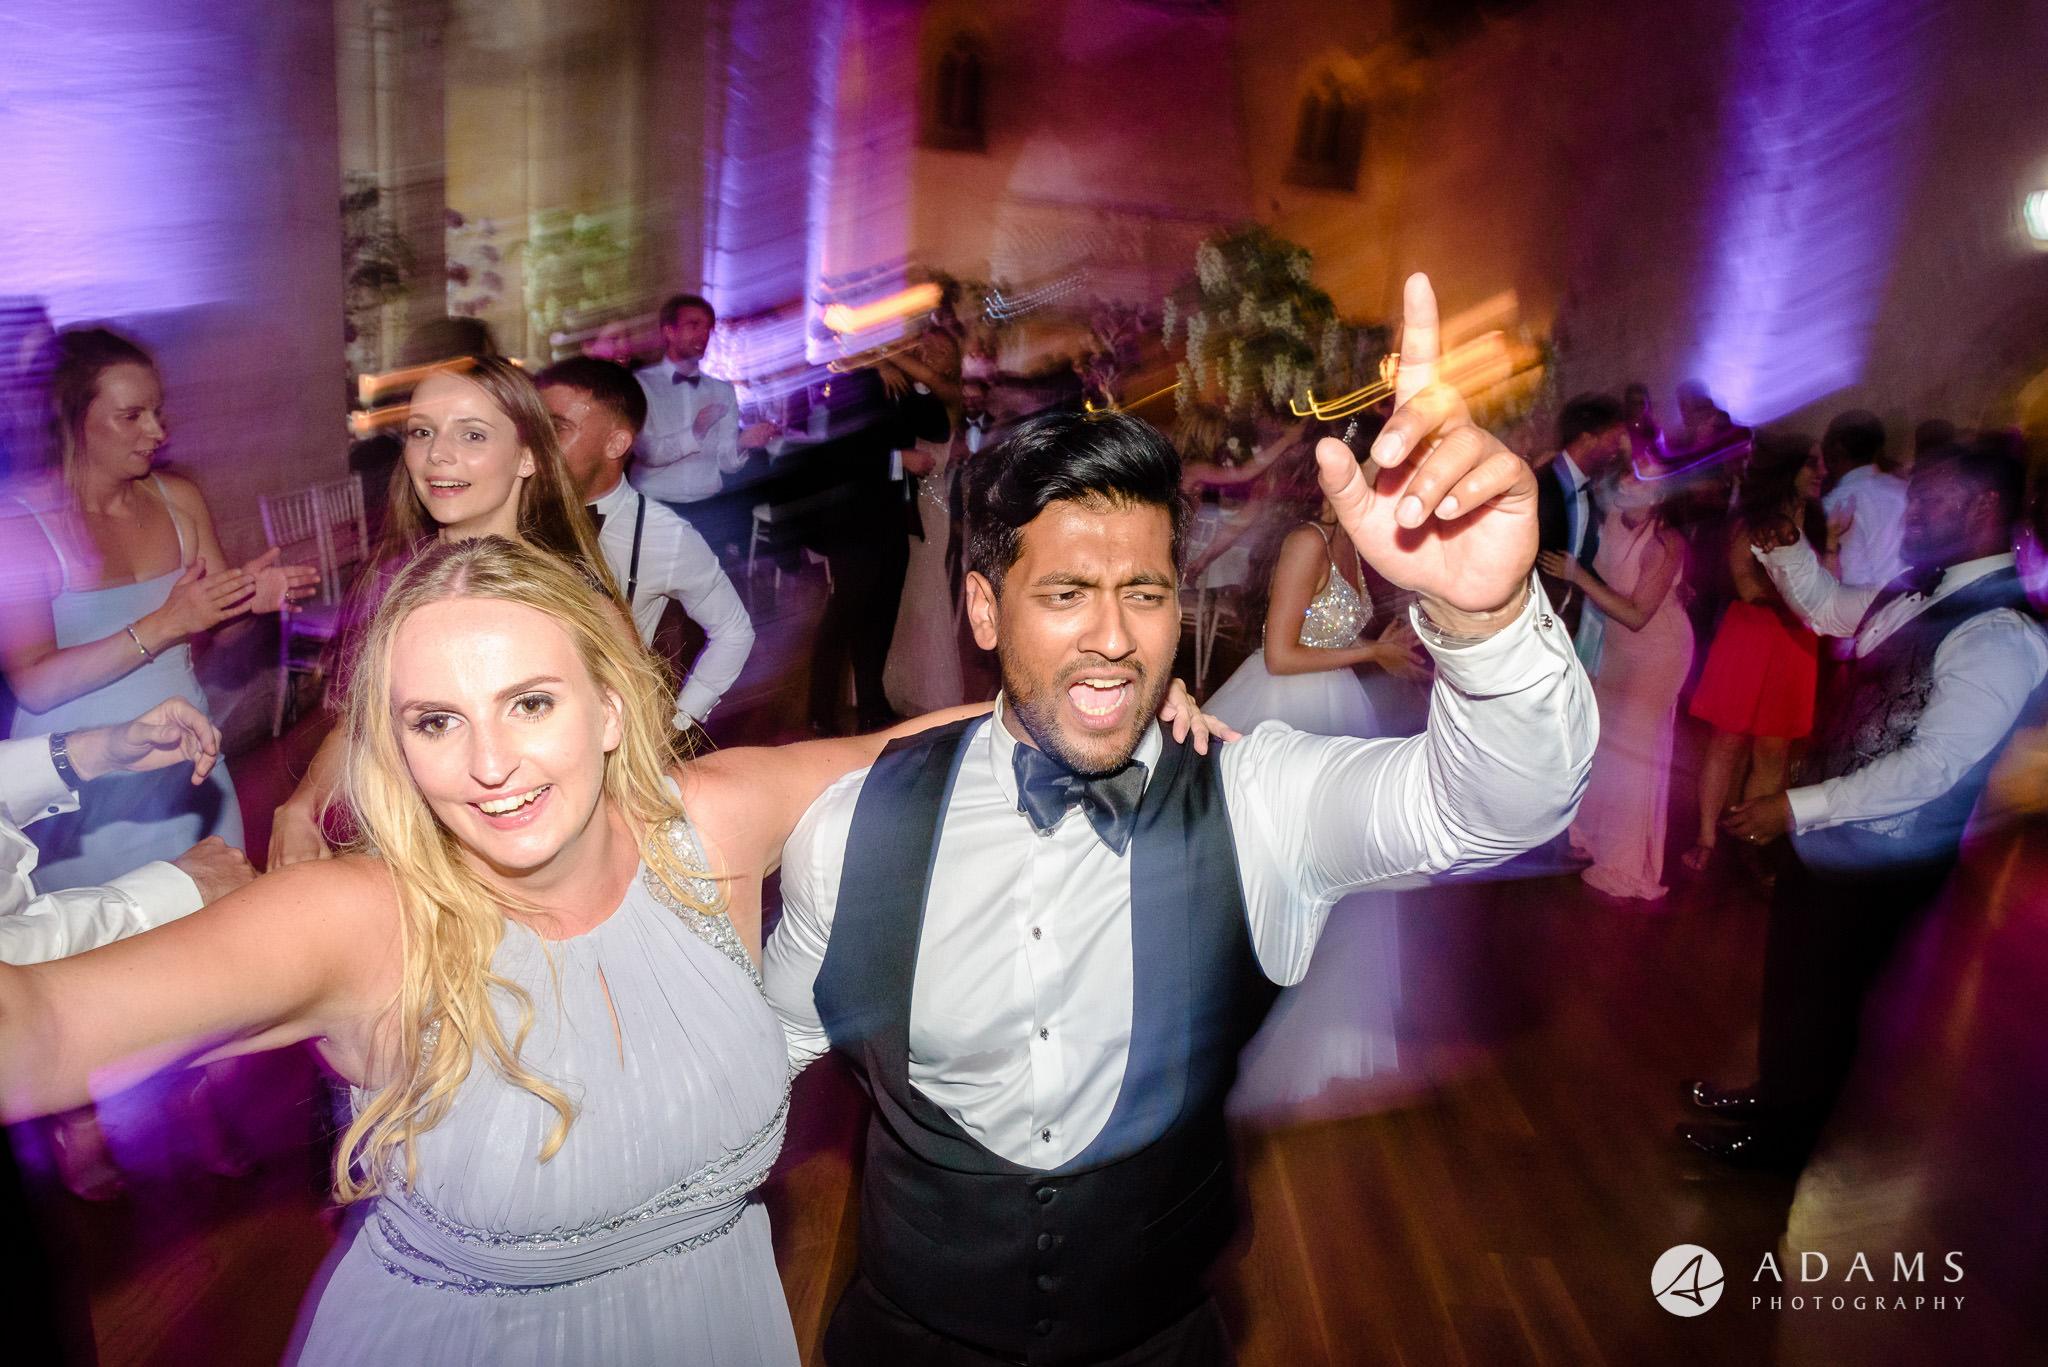 st donats castle wedding guests rising hands